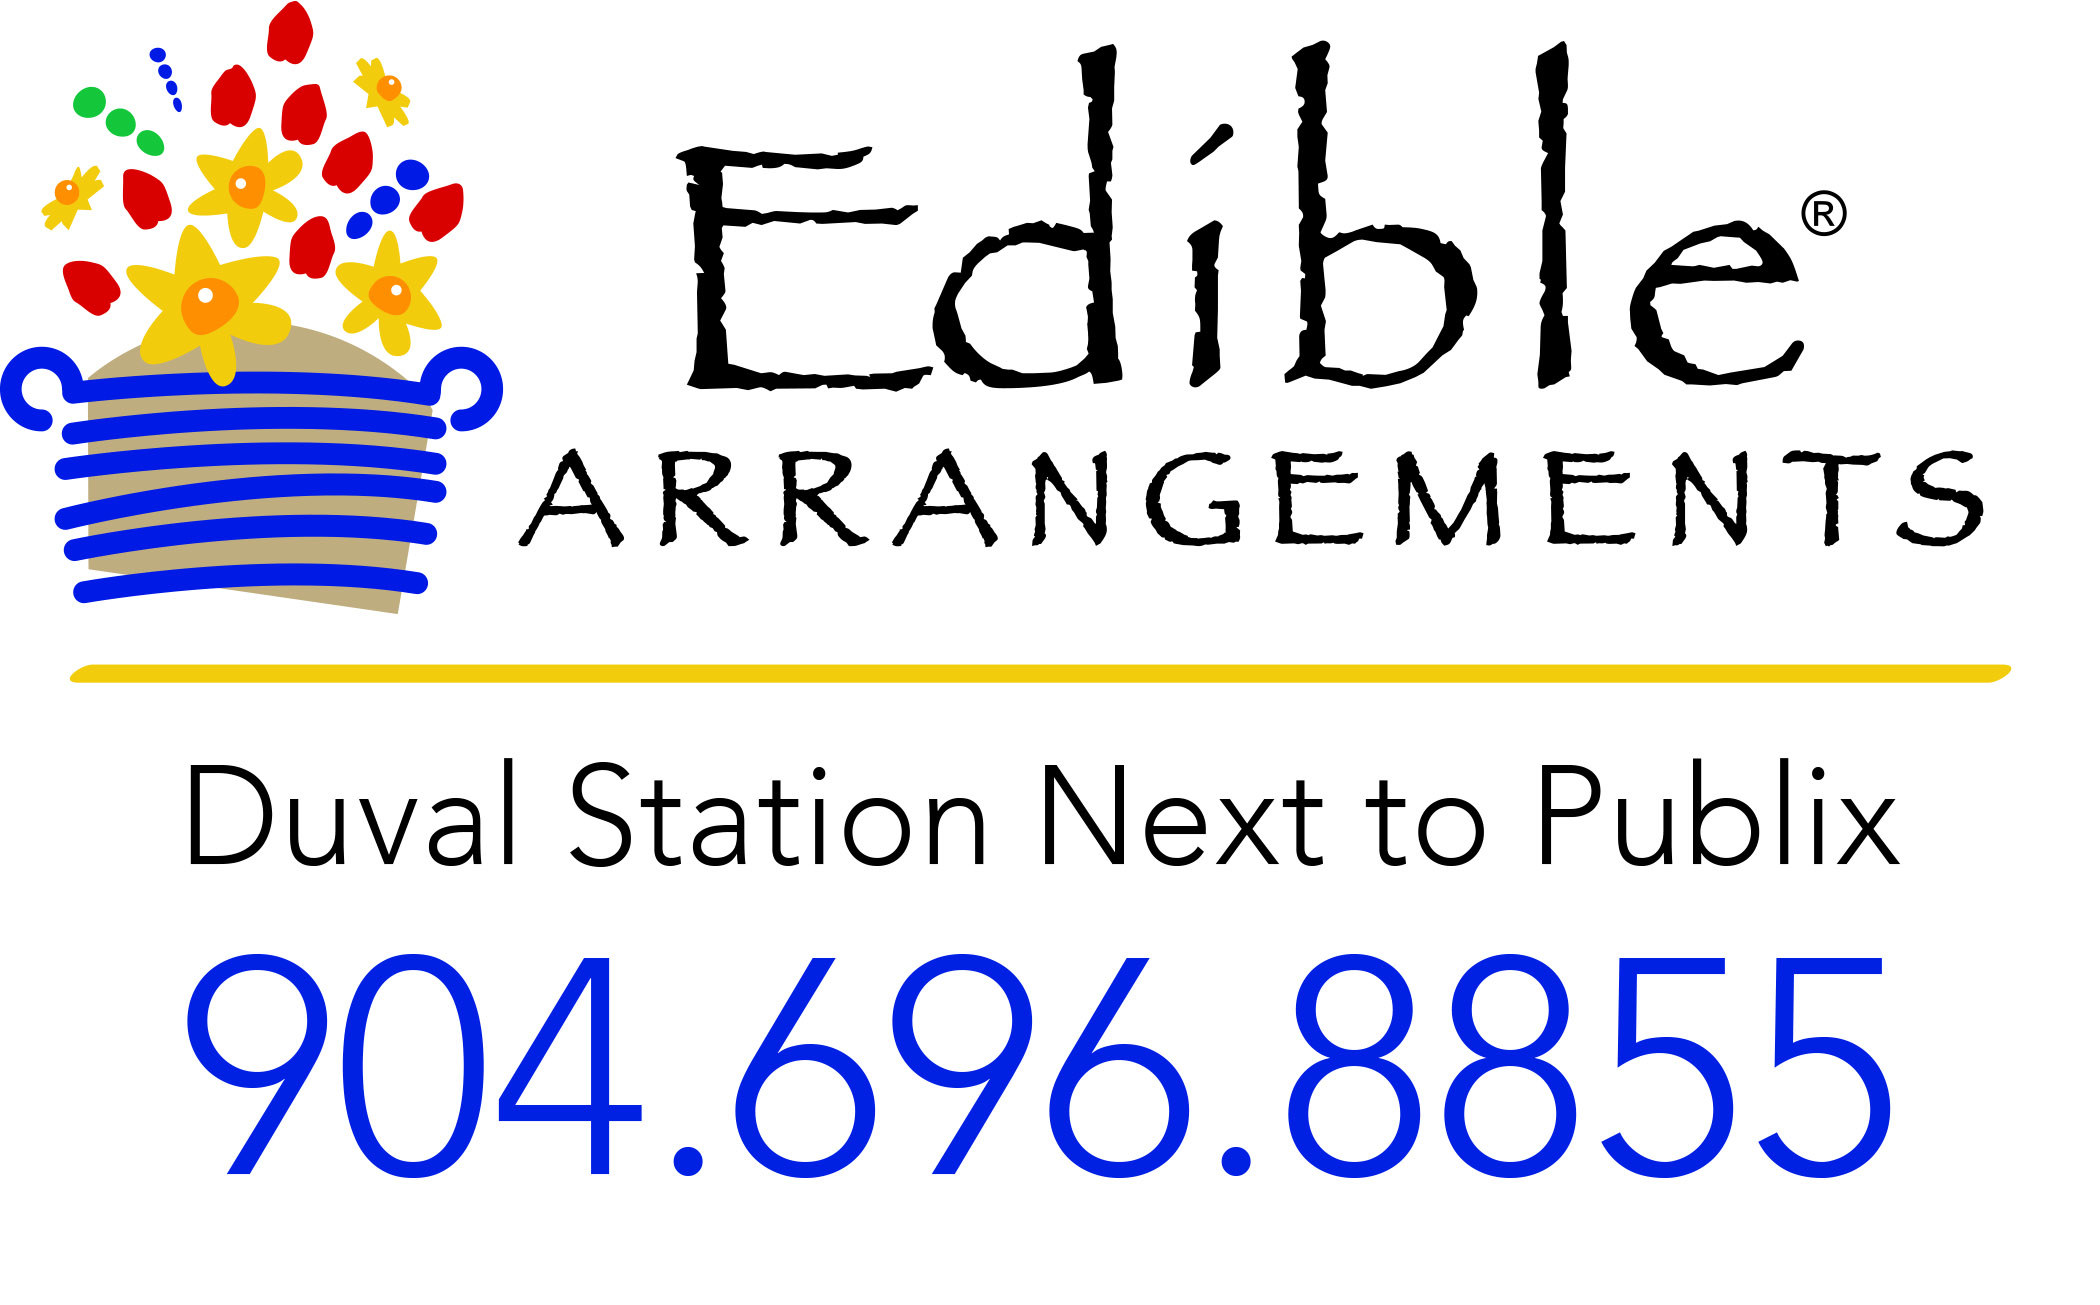 EdibleArrangements_Duval2